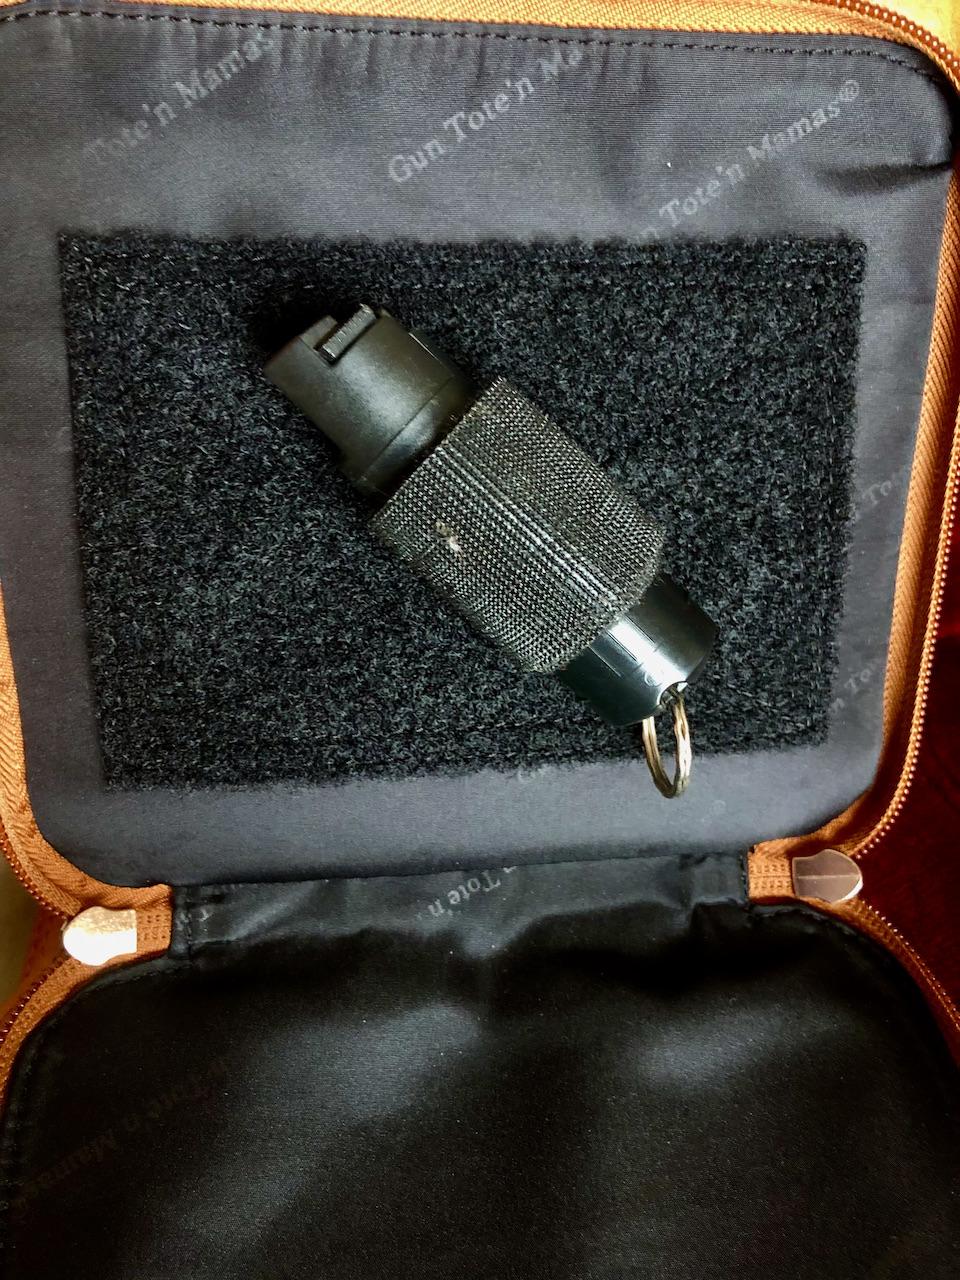 Mini BOHO pepper spray